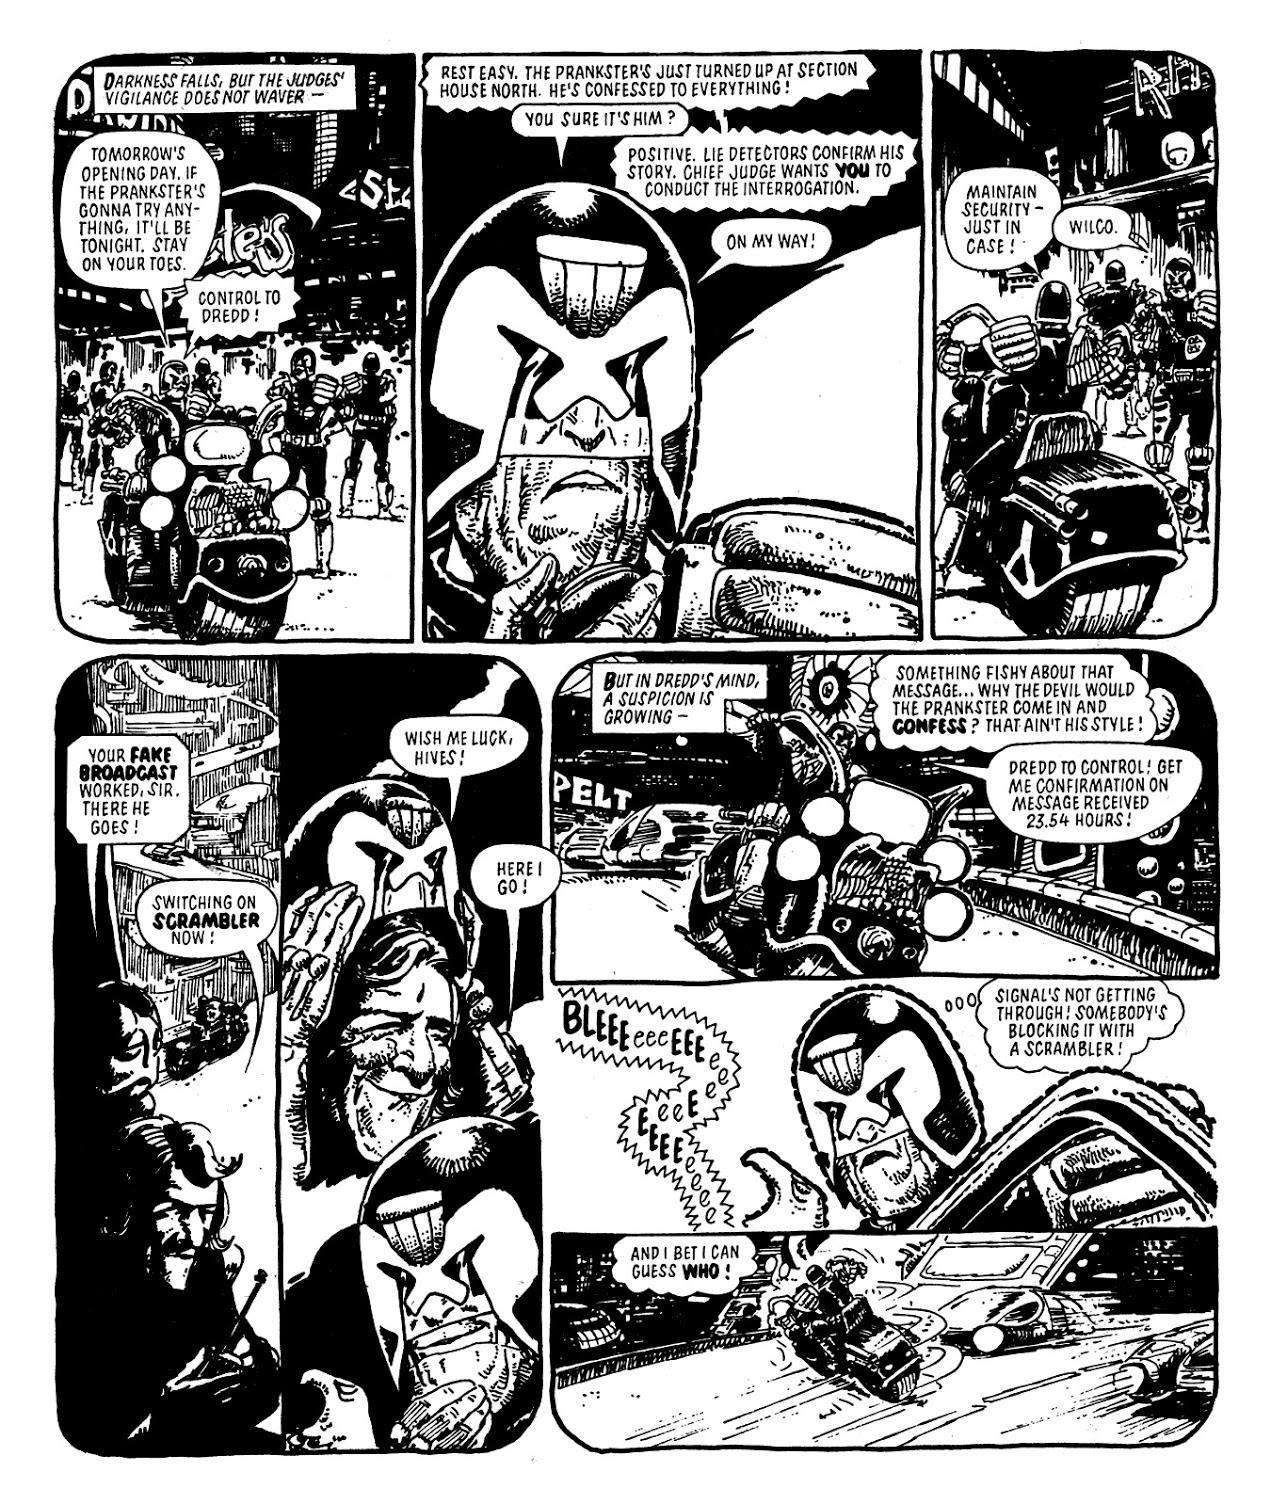 Judge Dredd 23 review